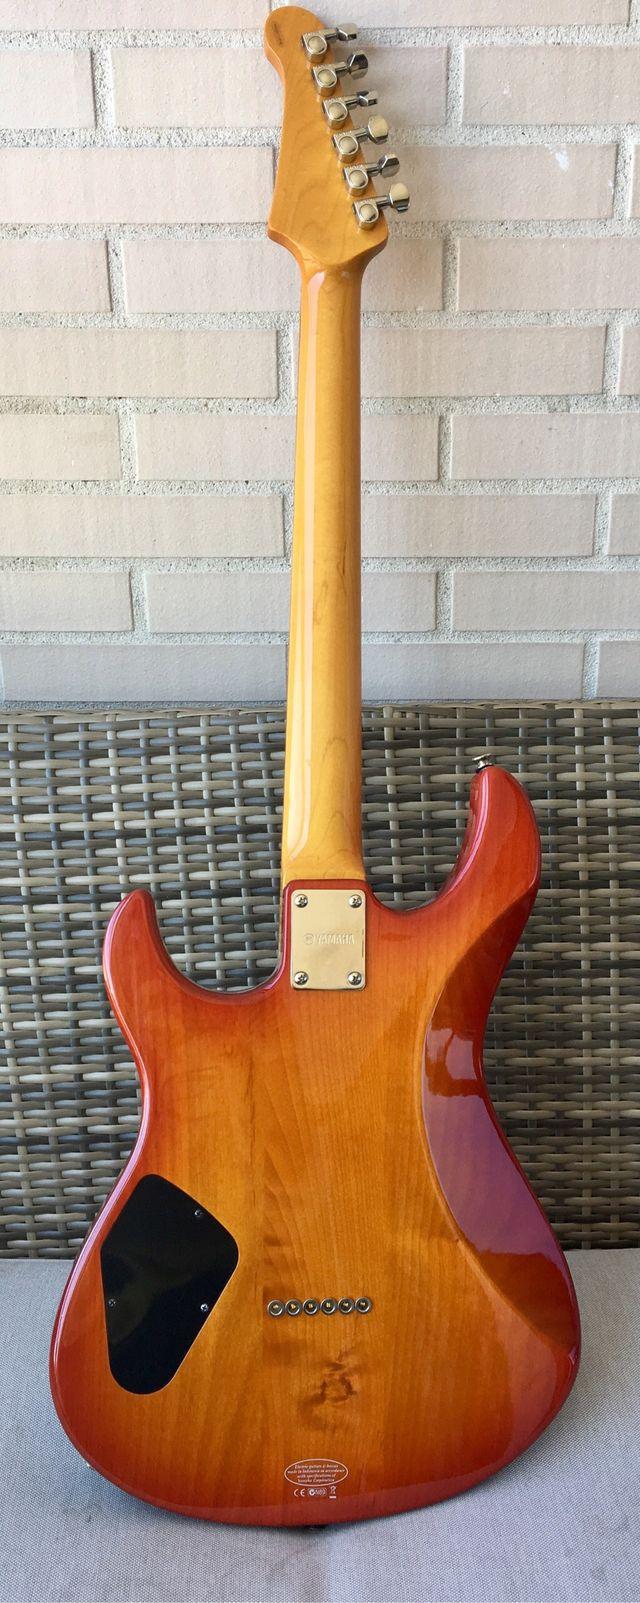 Guitarra electrica Yamaha Pacifica 611 HFM LAB